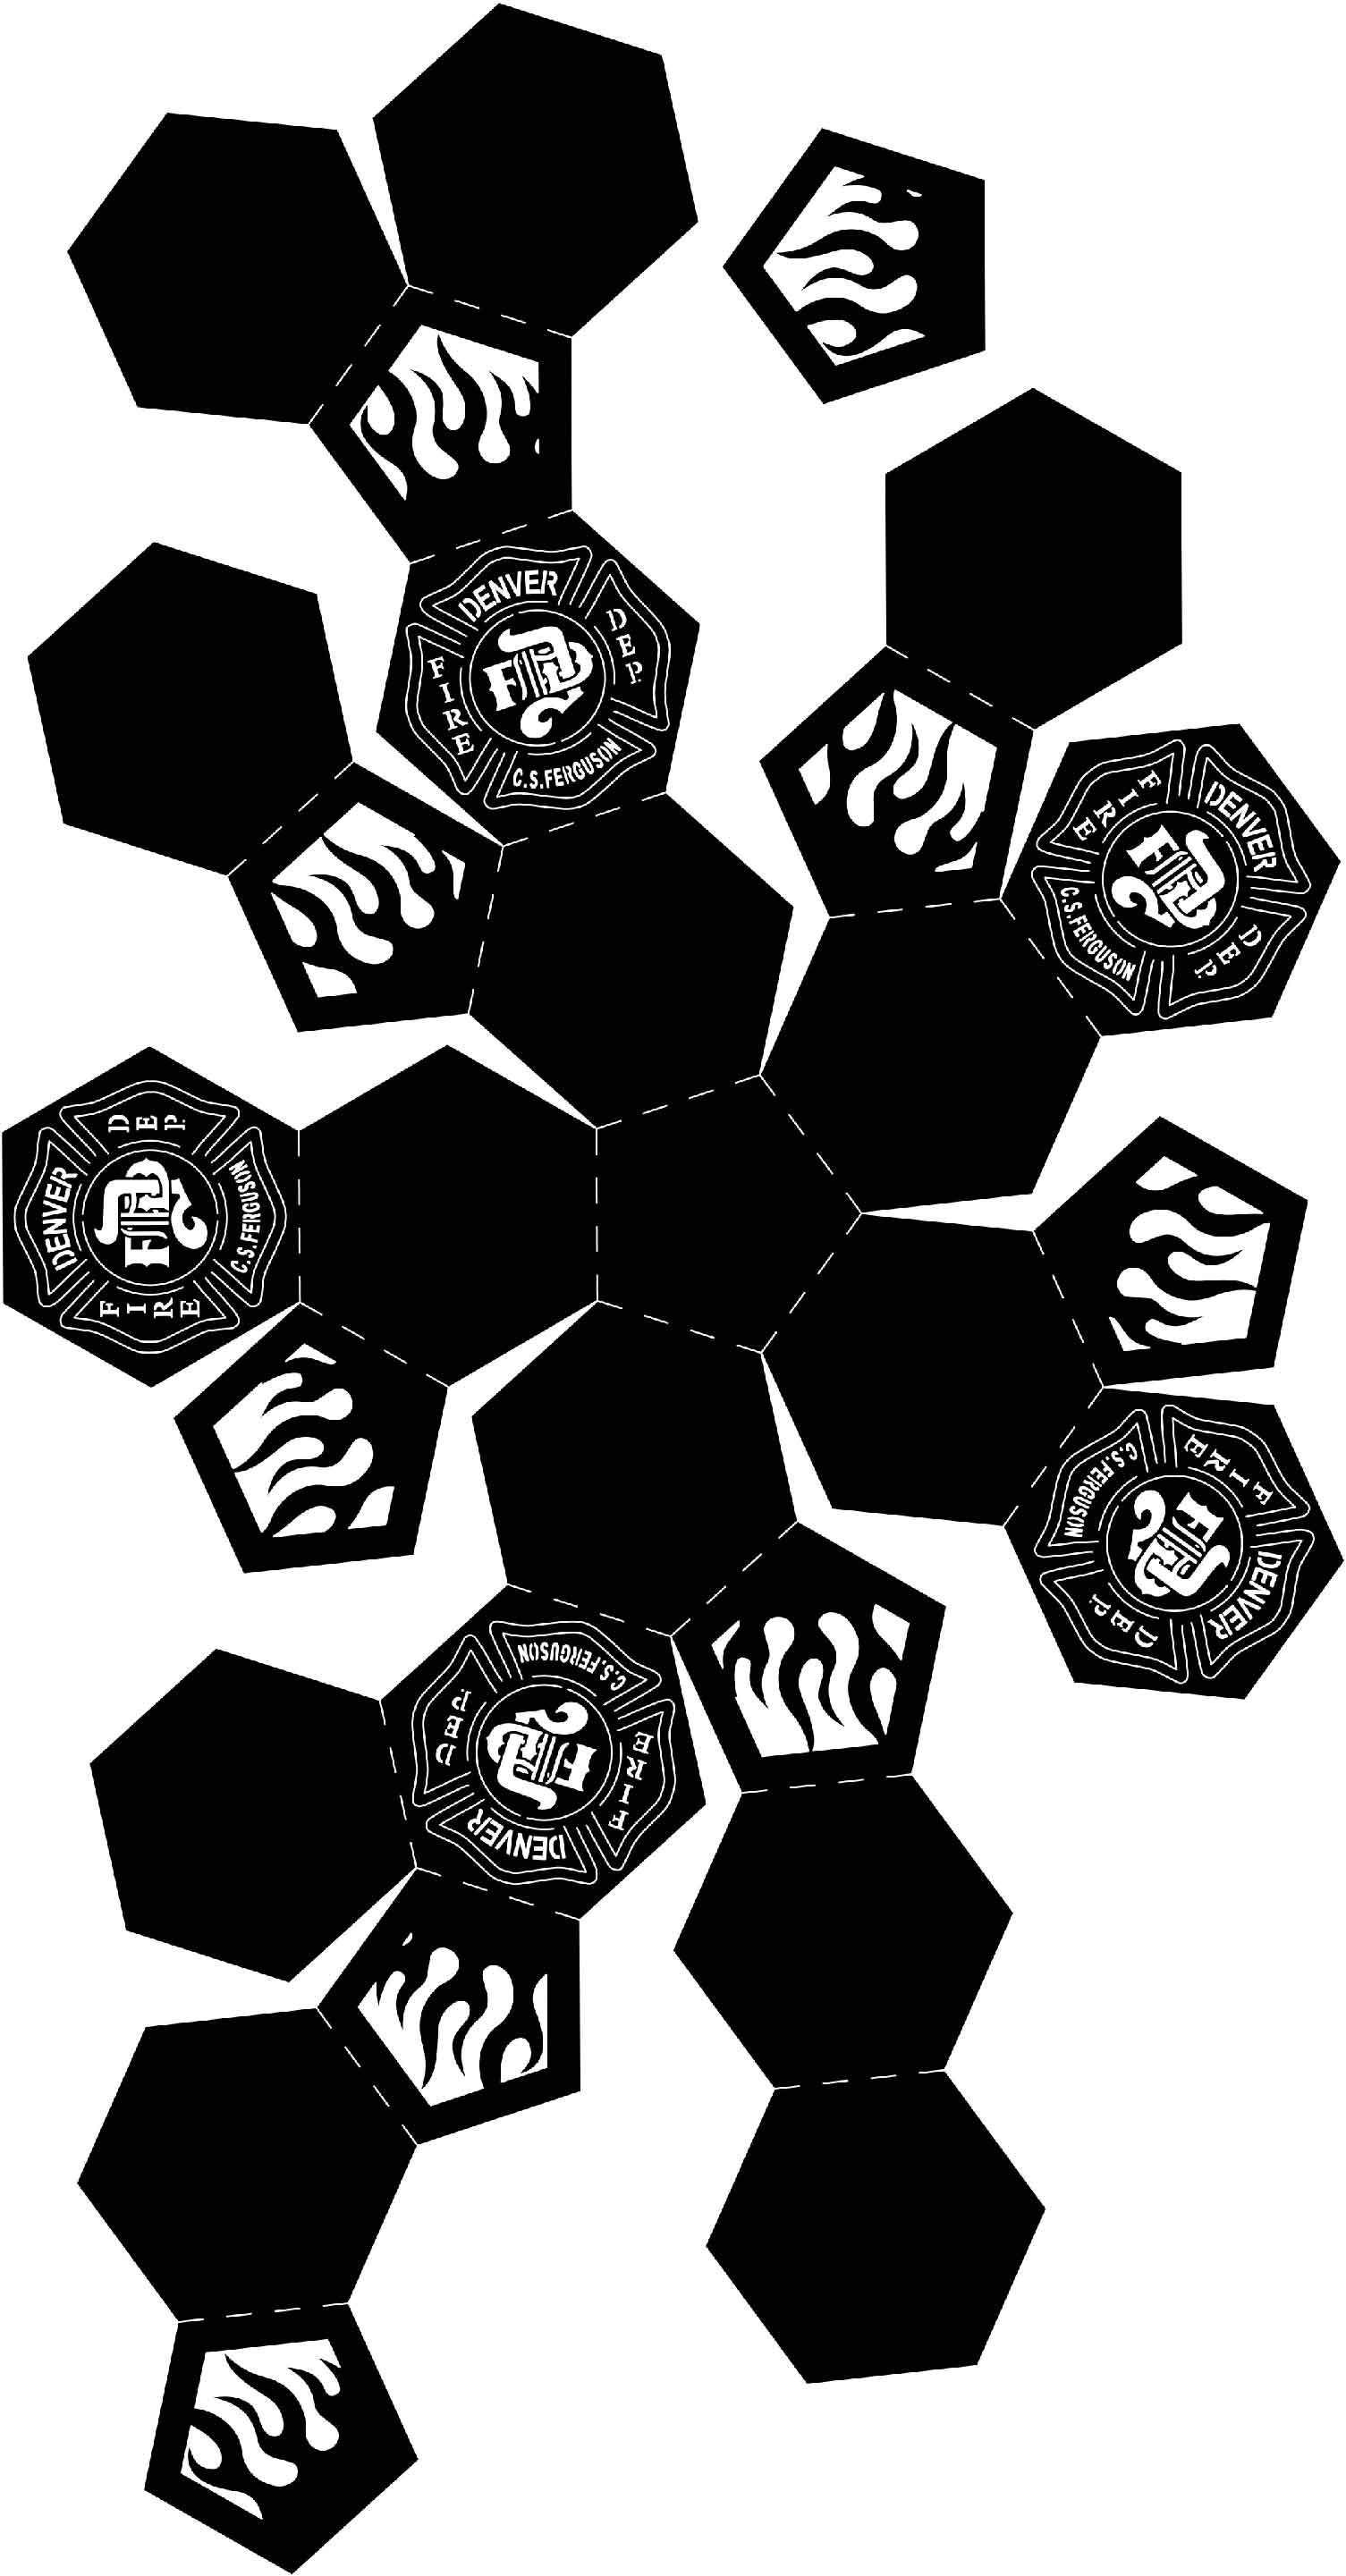 Fire Pit Ball Denver Firefighter Logo с изображениями